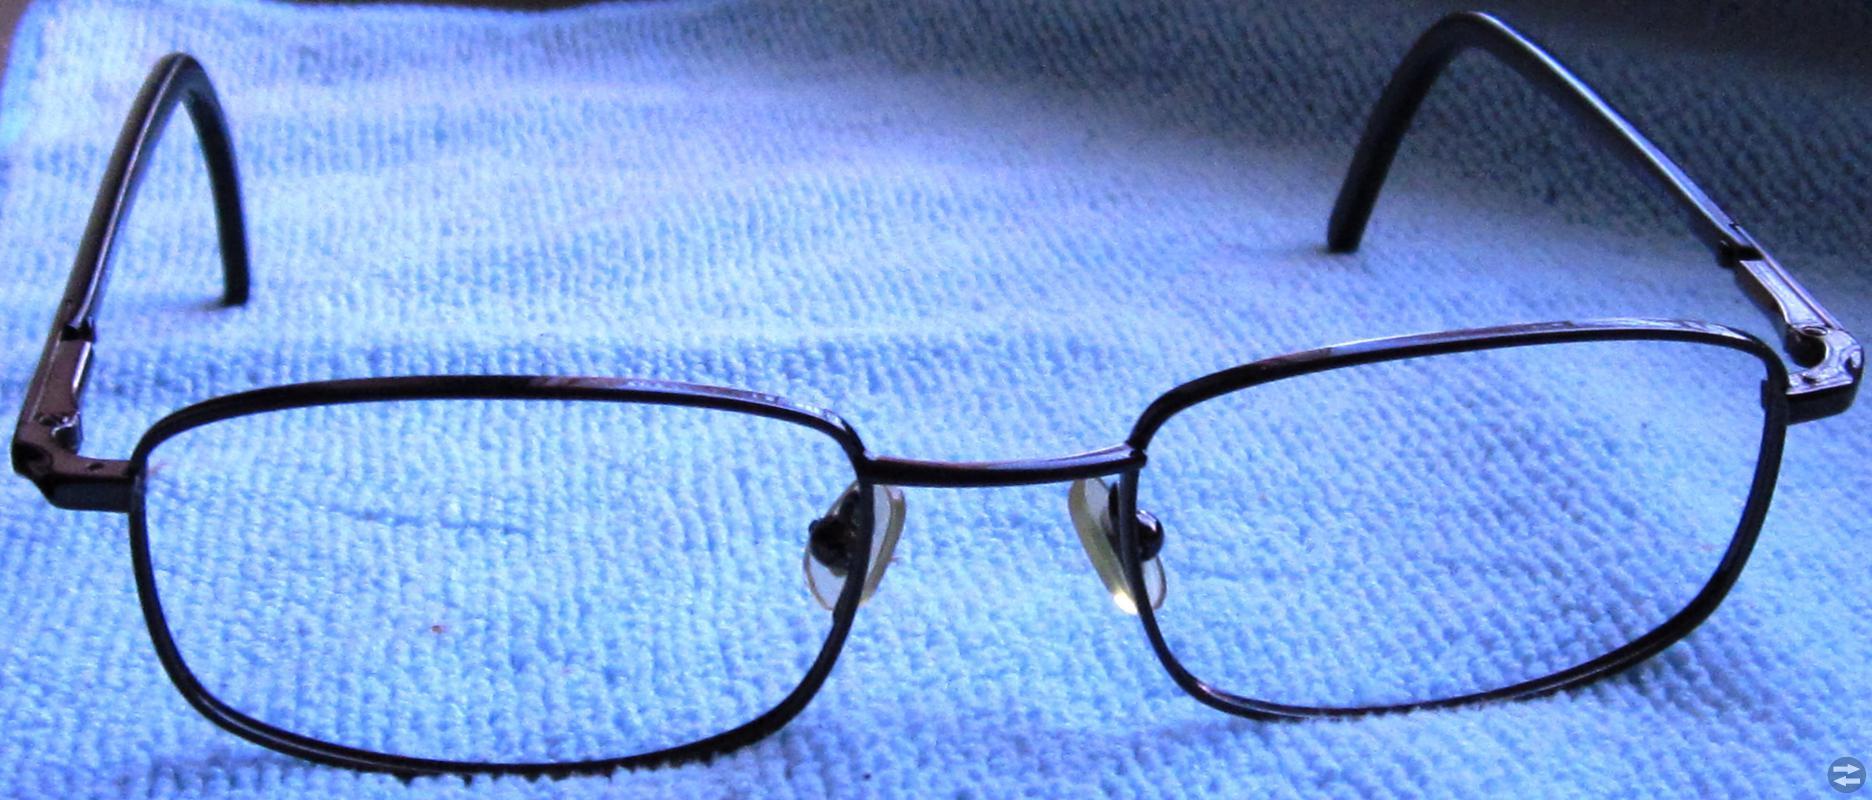 Beg CADORE glasögon båge